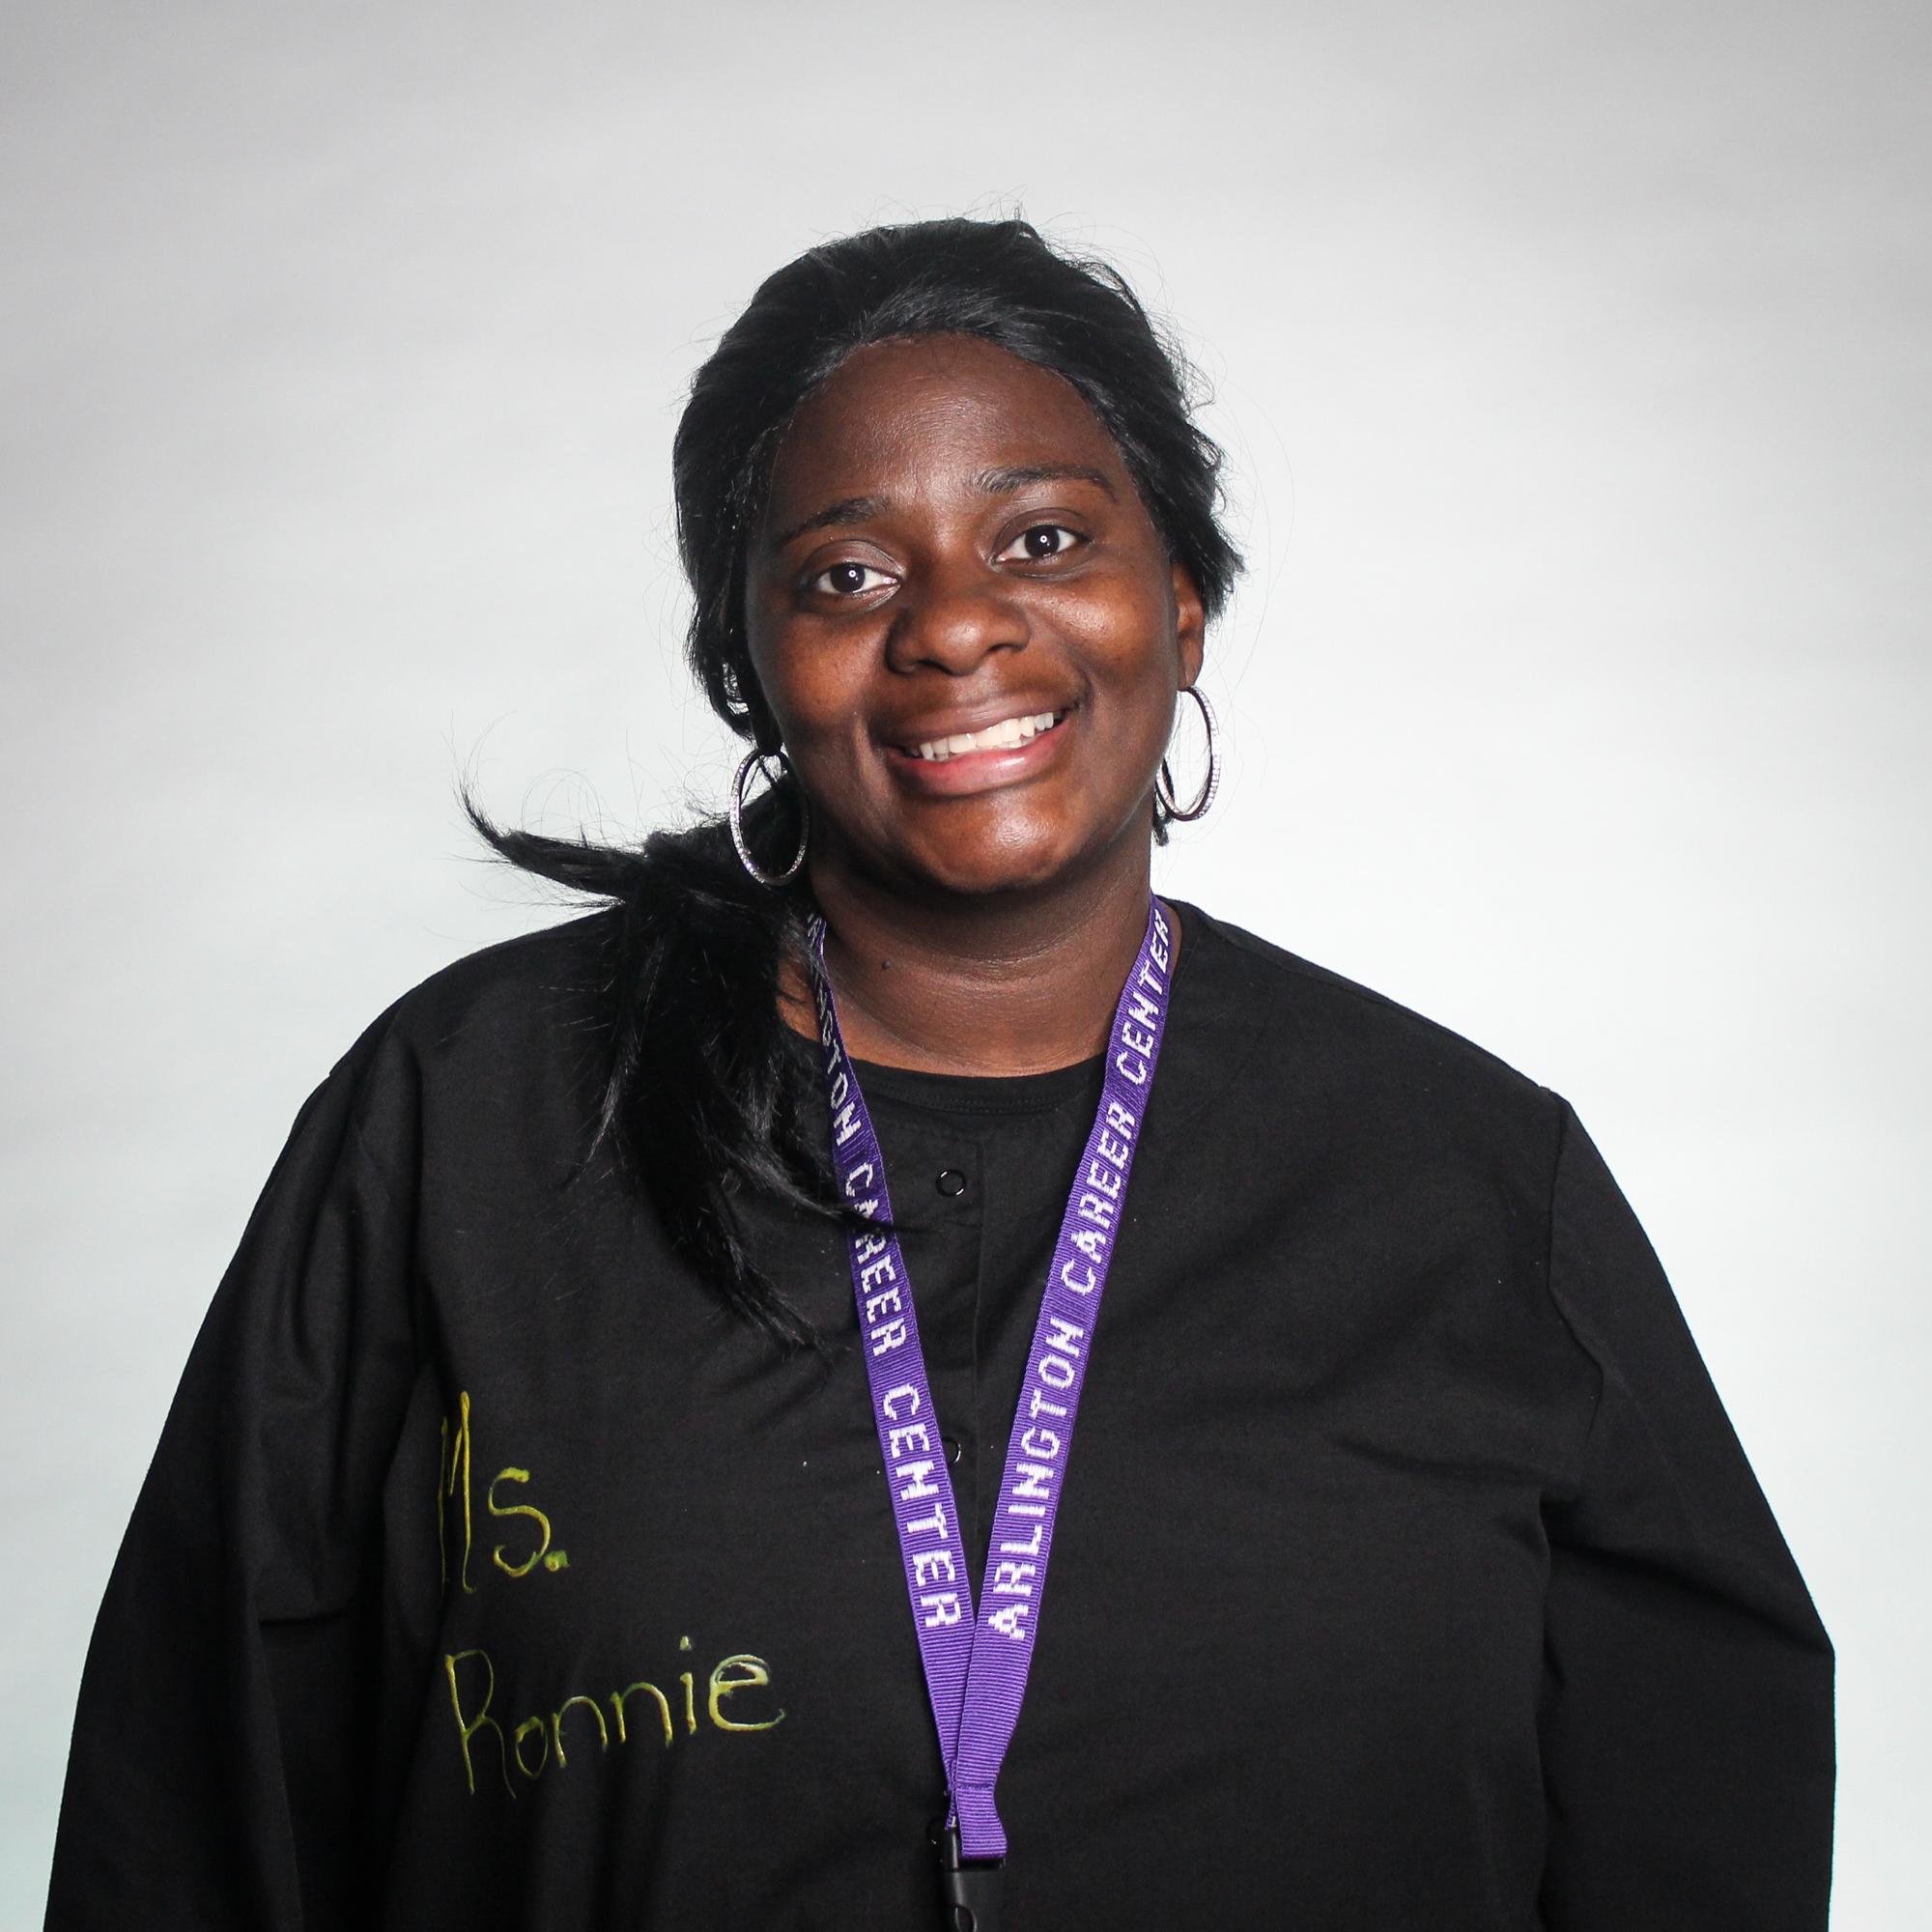 Ms. Veronica Cross